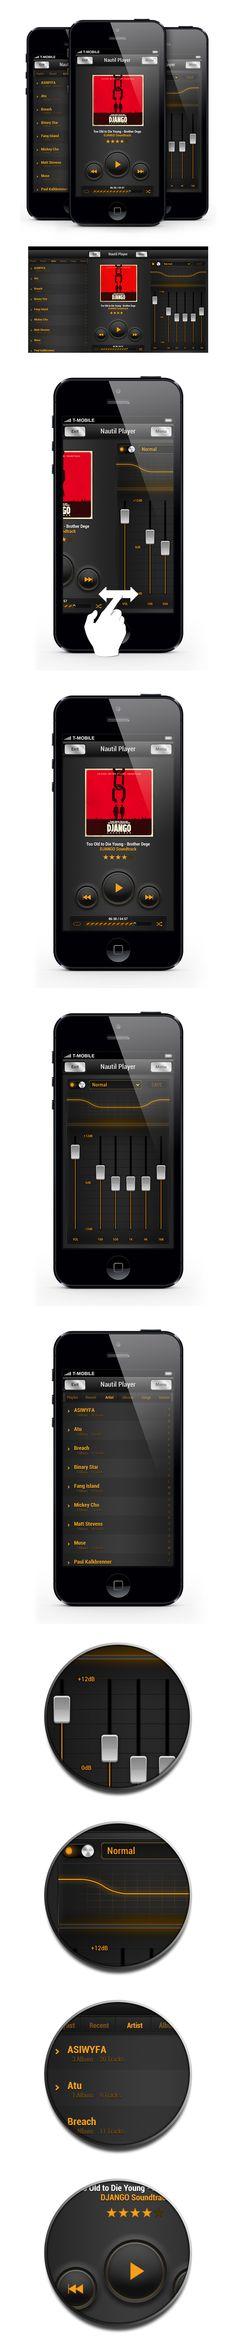 FREE PSD - Nautil Player by gabor styt, via Behance *** #freepsd #psd #gui #ui #app #behance